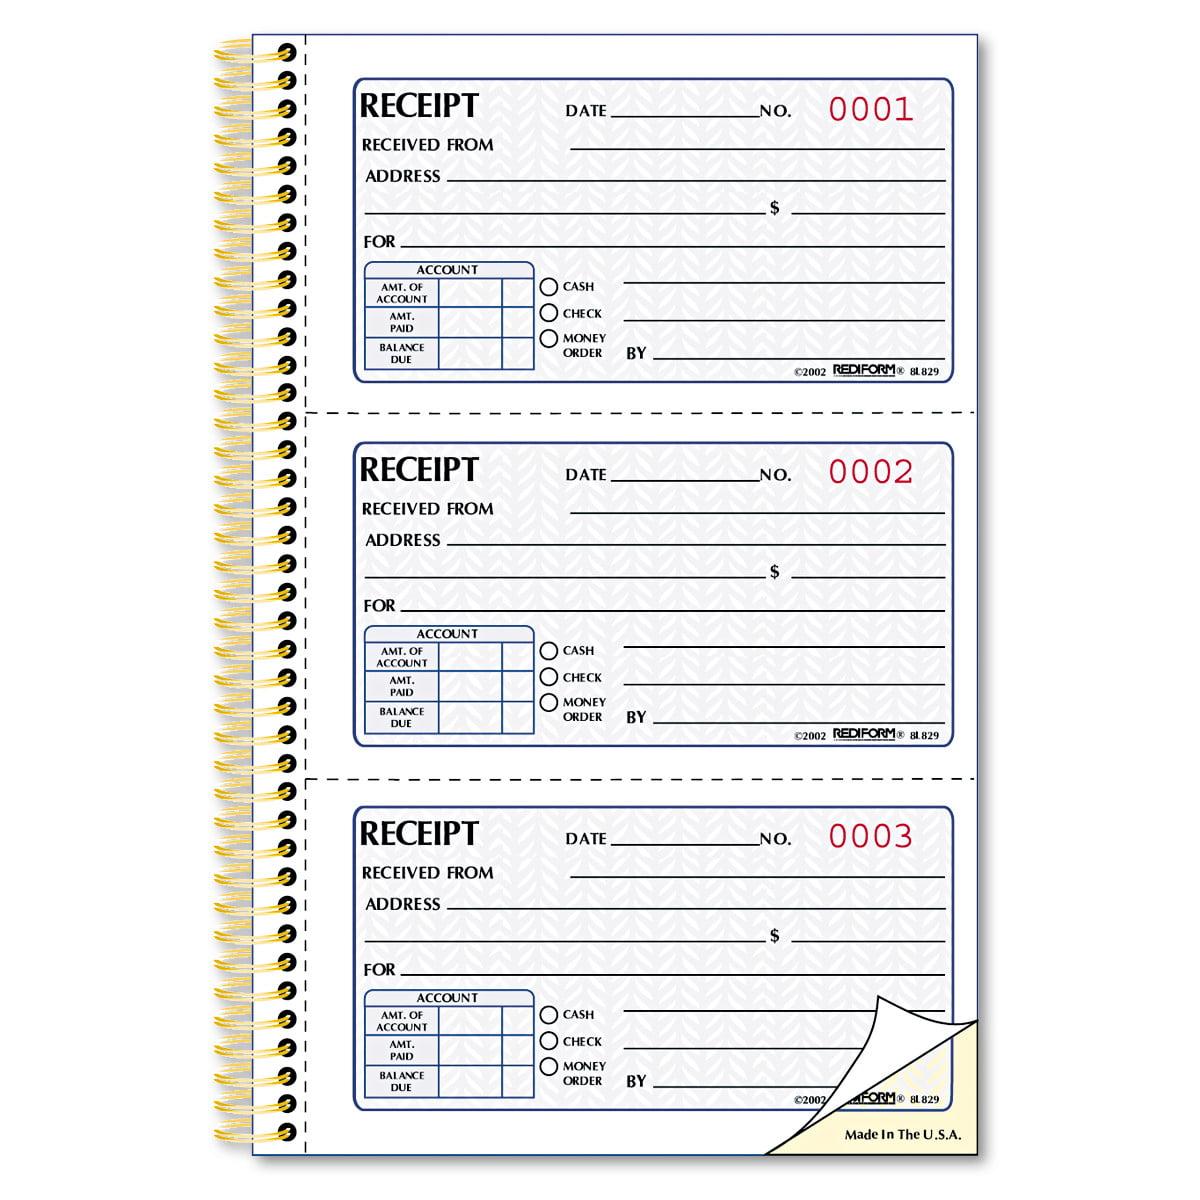 Rediform Money Receipt Book, 5 x 2 3/4, Two-Part Carbonless, 225 Sets/Book